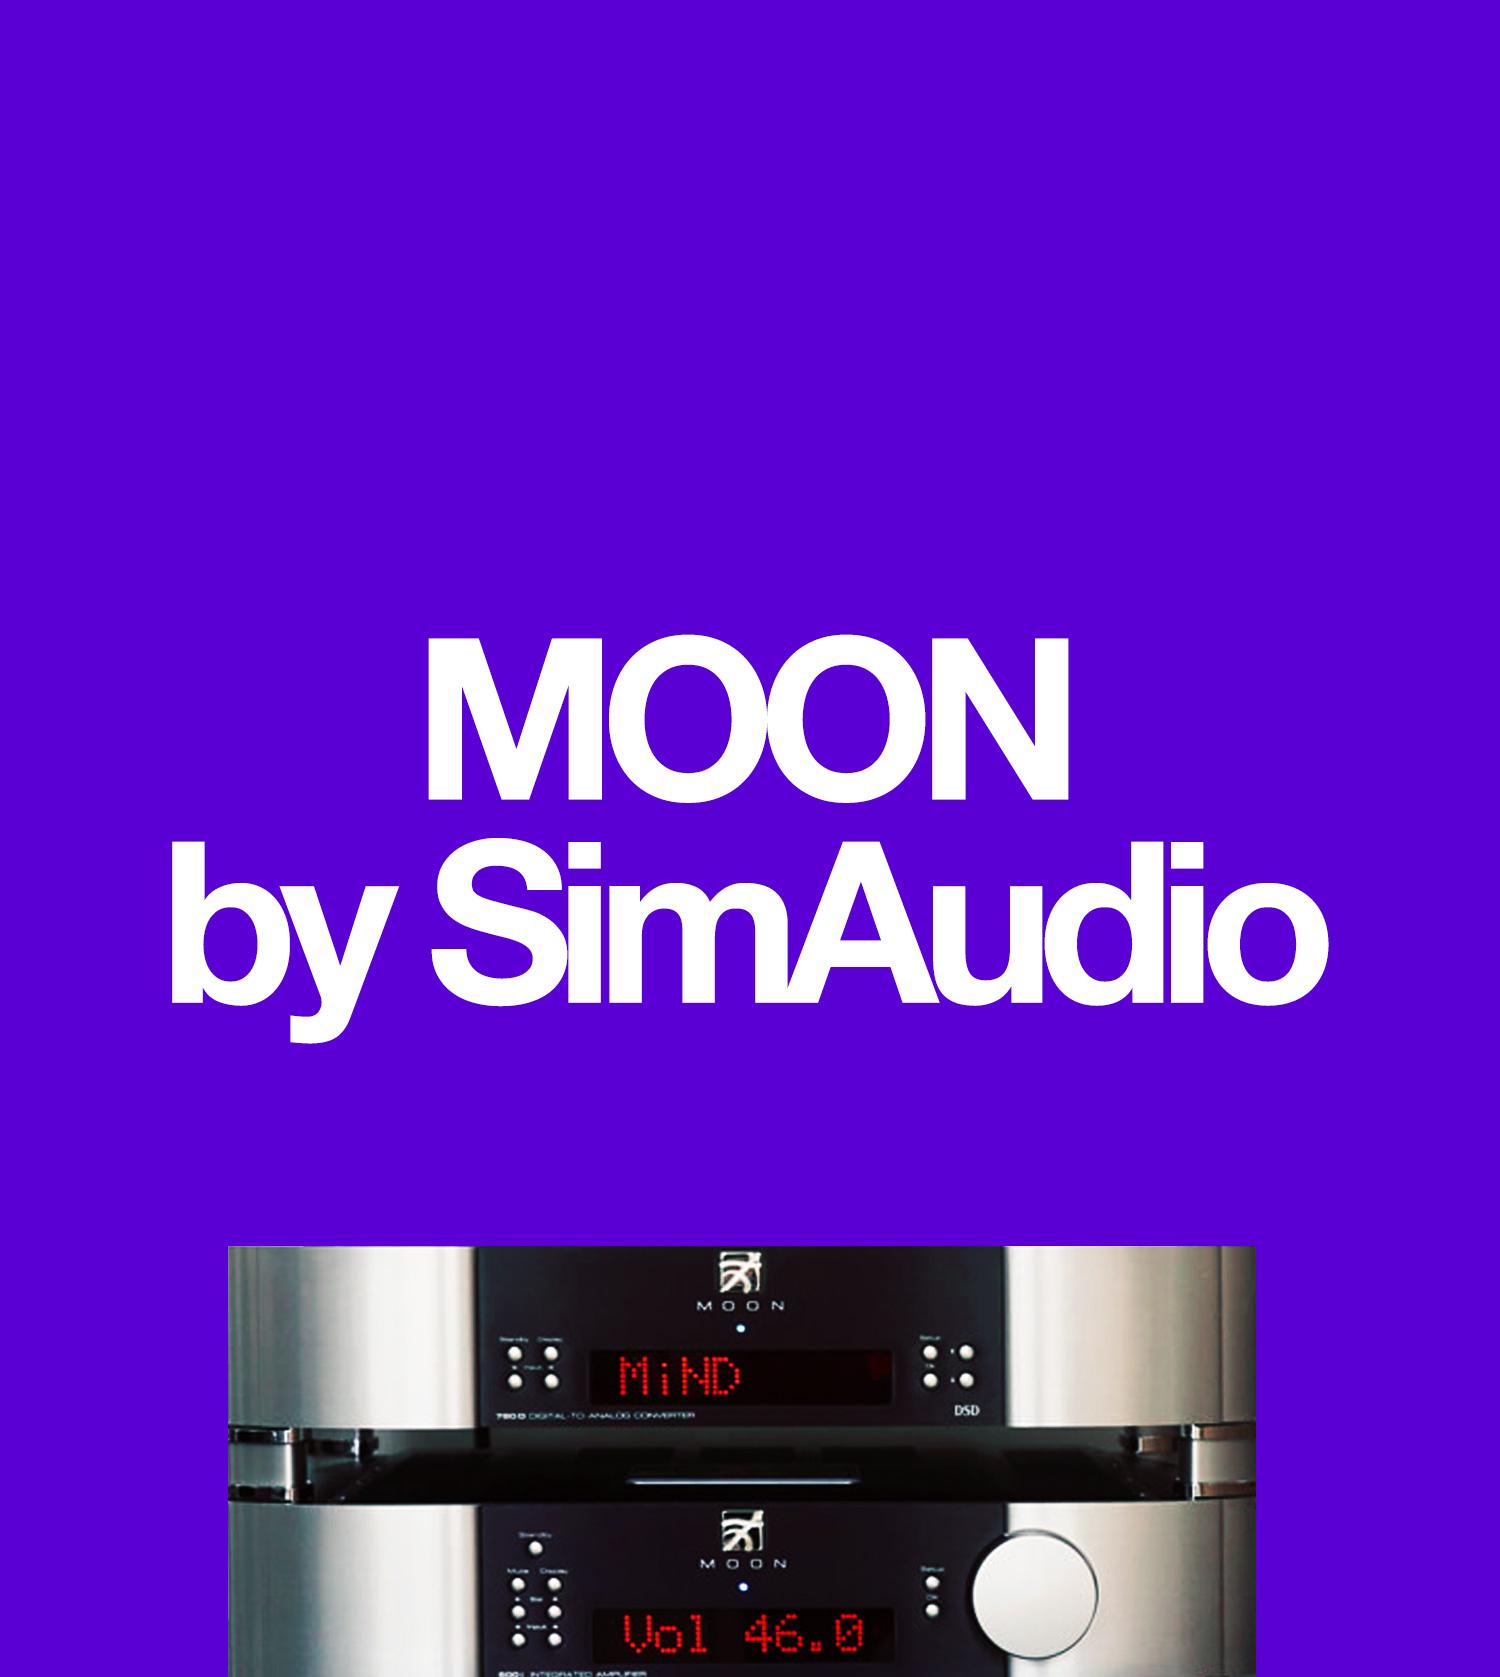 MOON by SimAudio, Hi-Fi